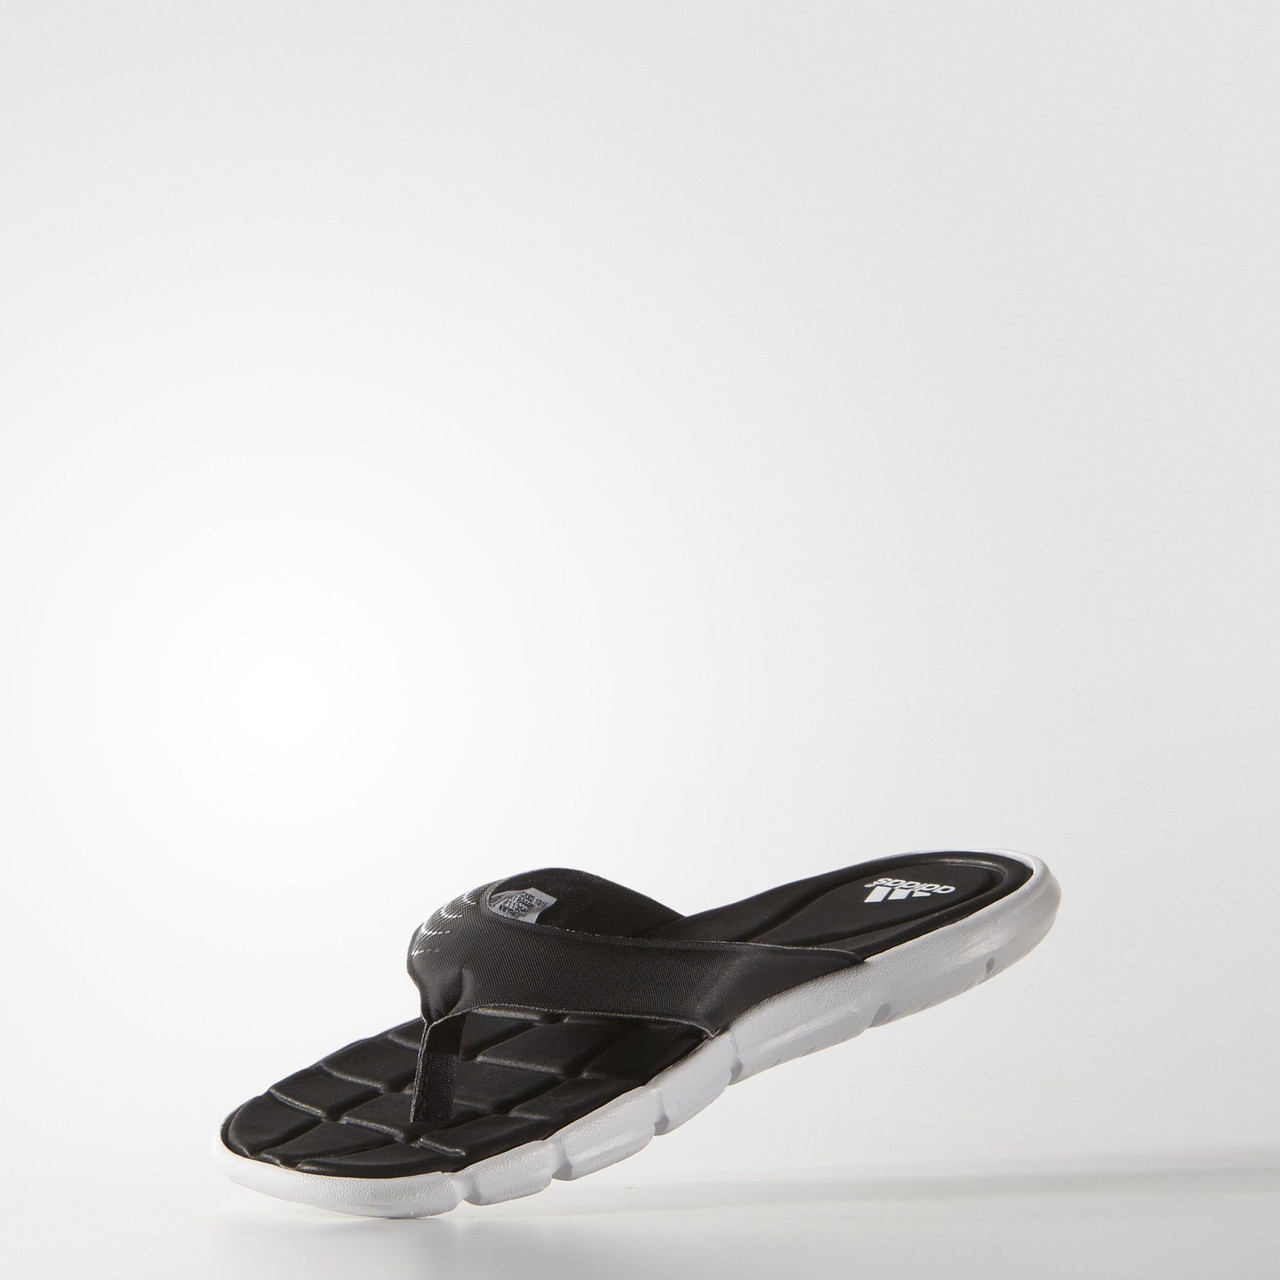 ddbc84f5d314 Женские шлепанцы adidas adipure 360 Thongs (Артикул: B44485)